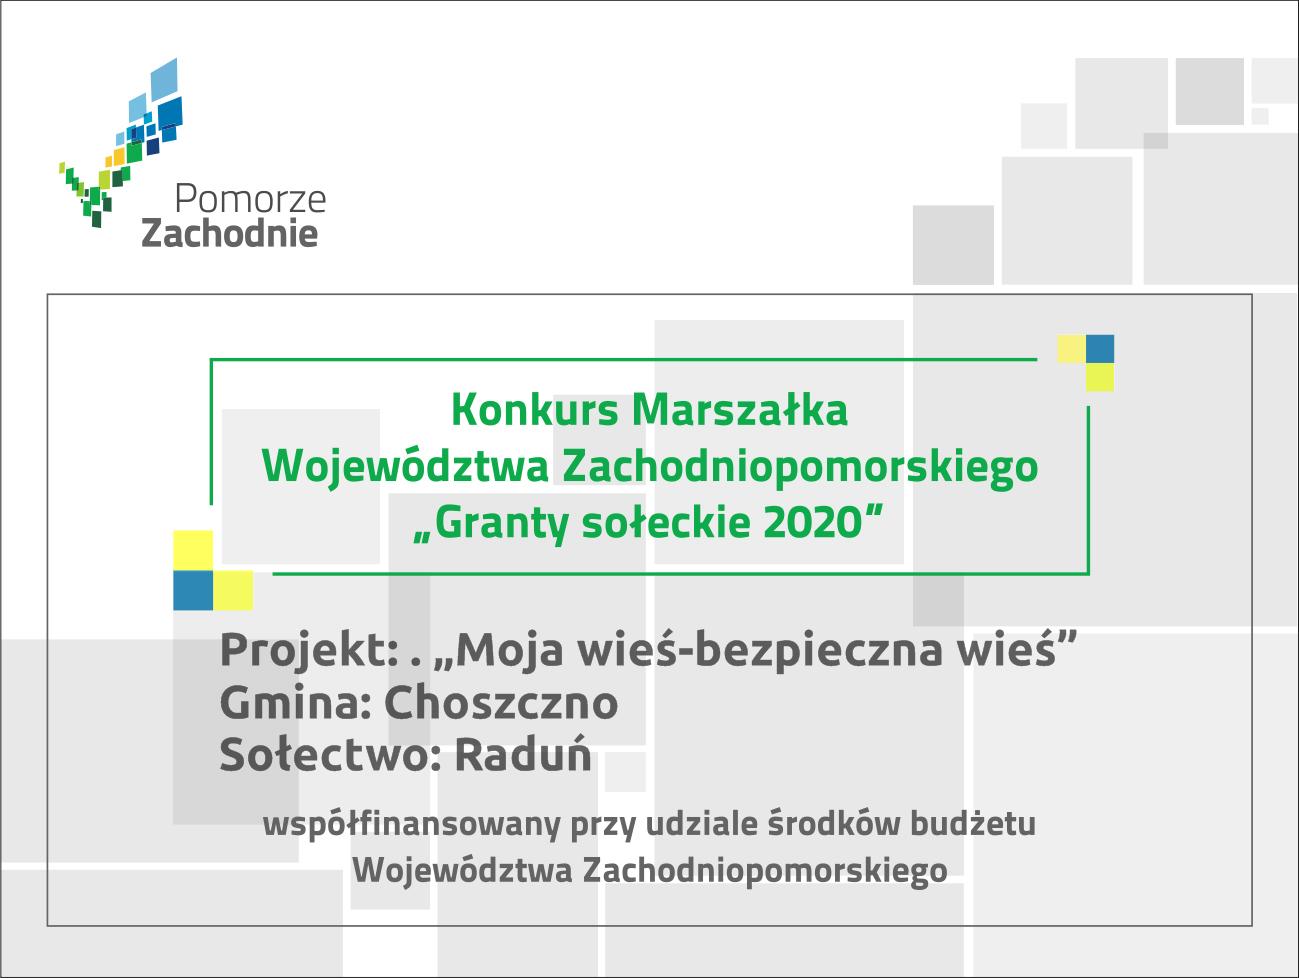 tablica grant sołectwo Raduń